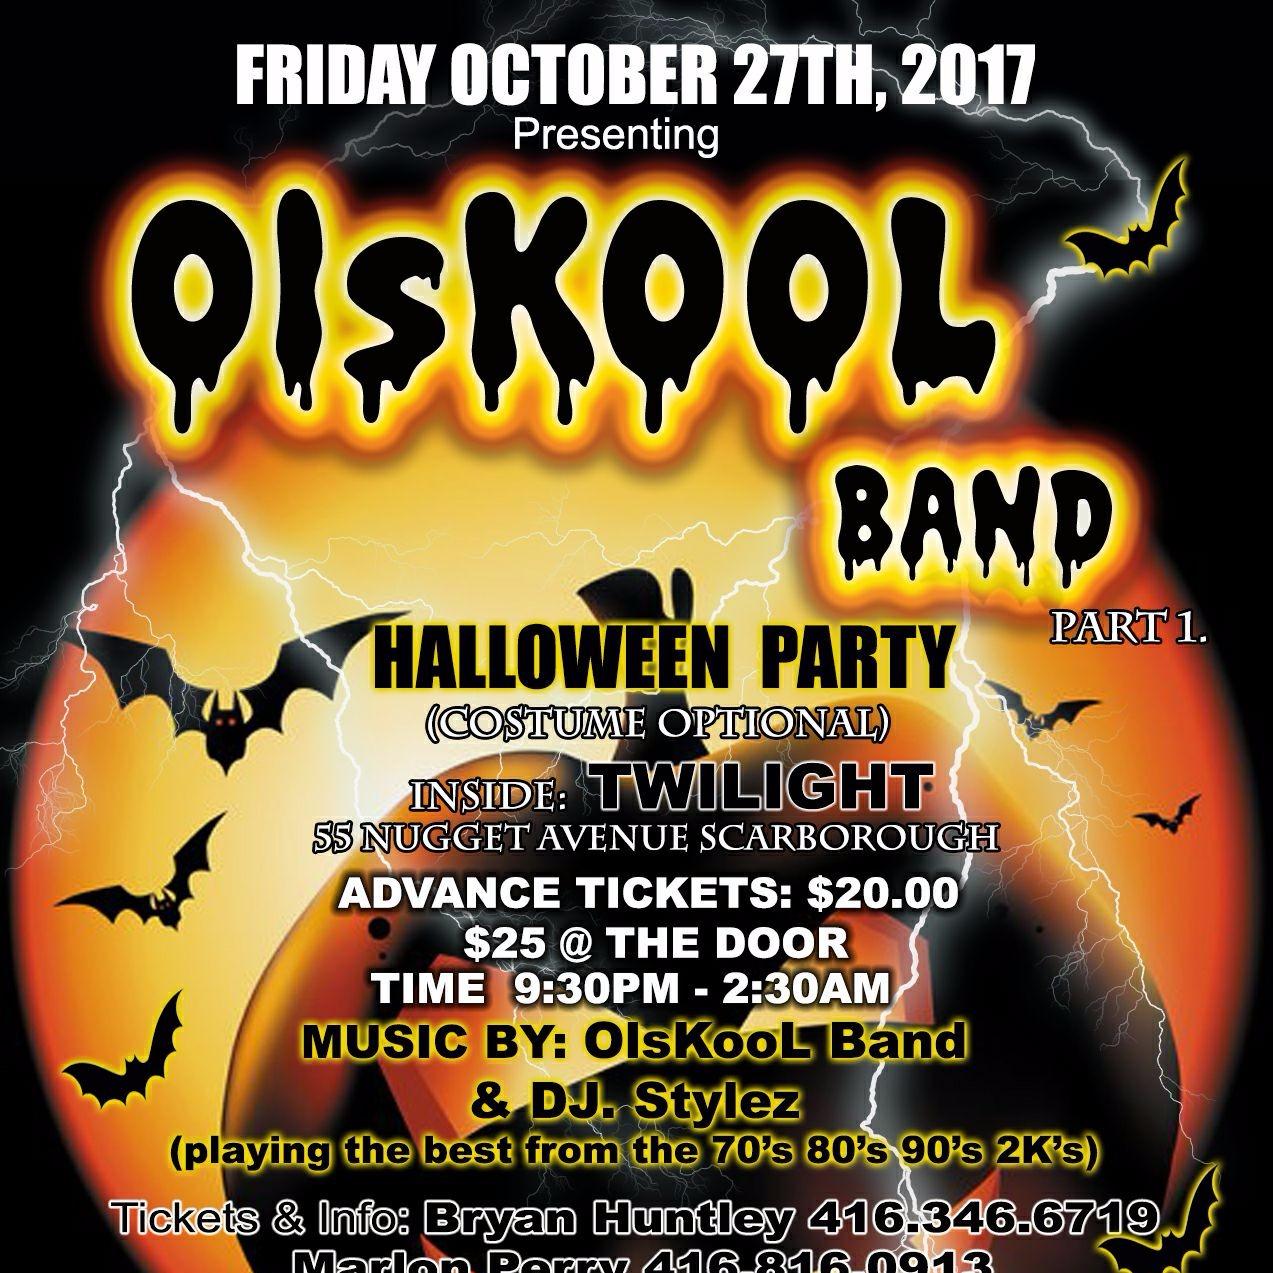 OLsKool BAND HALLOWEEN PARTY